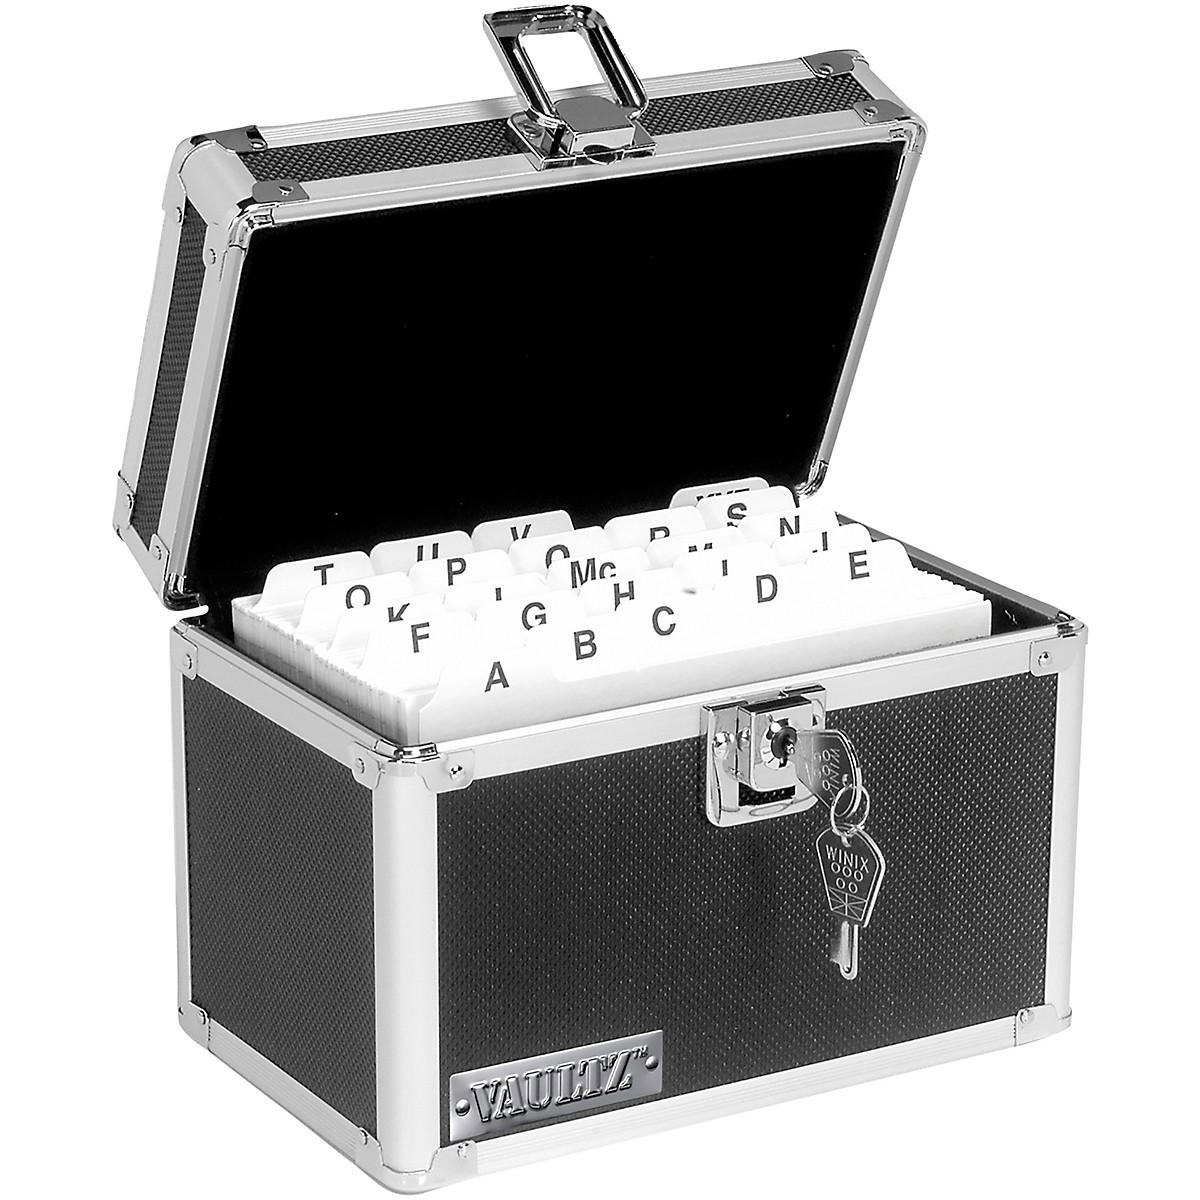 Vaultz Index Card Box - 4x6